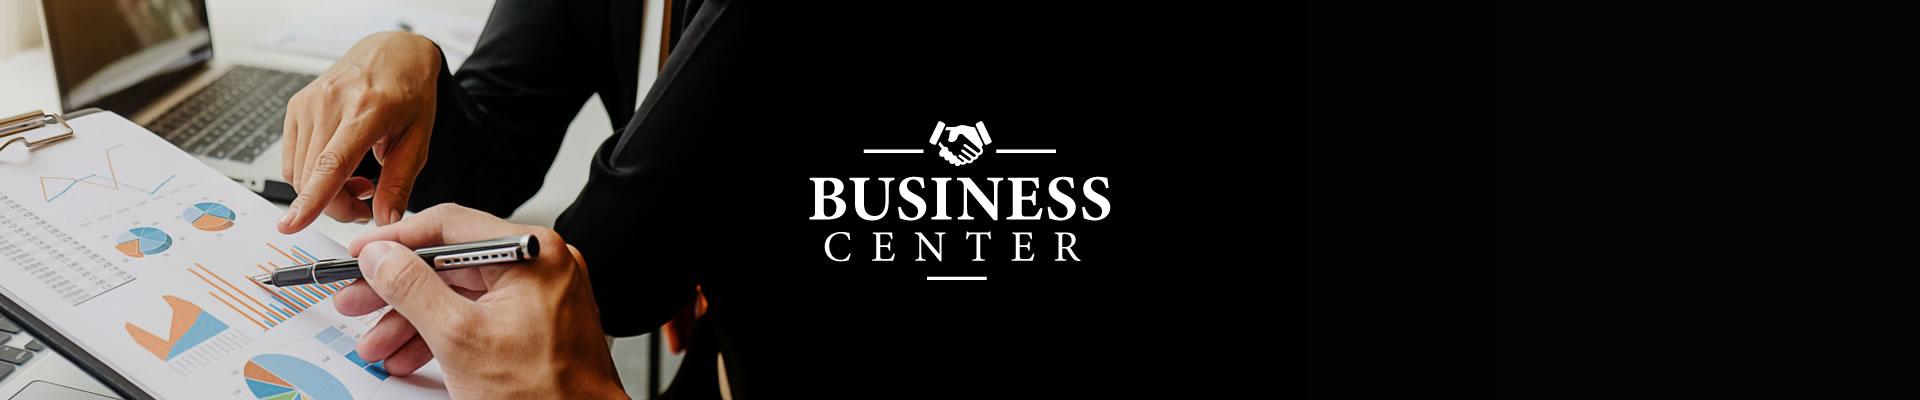 Bussines Center